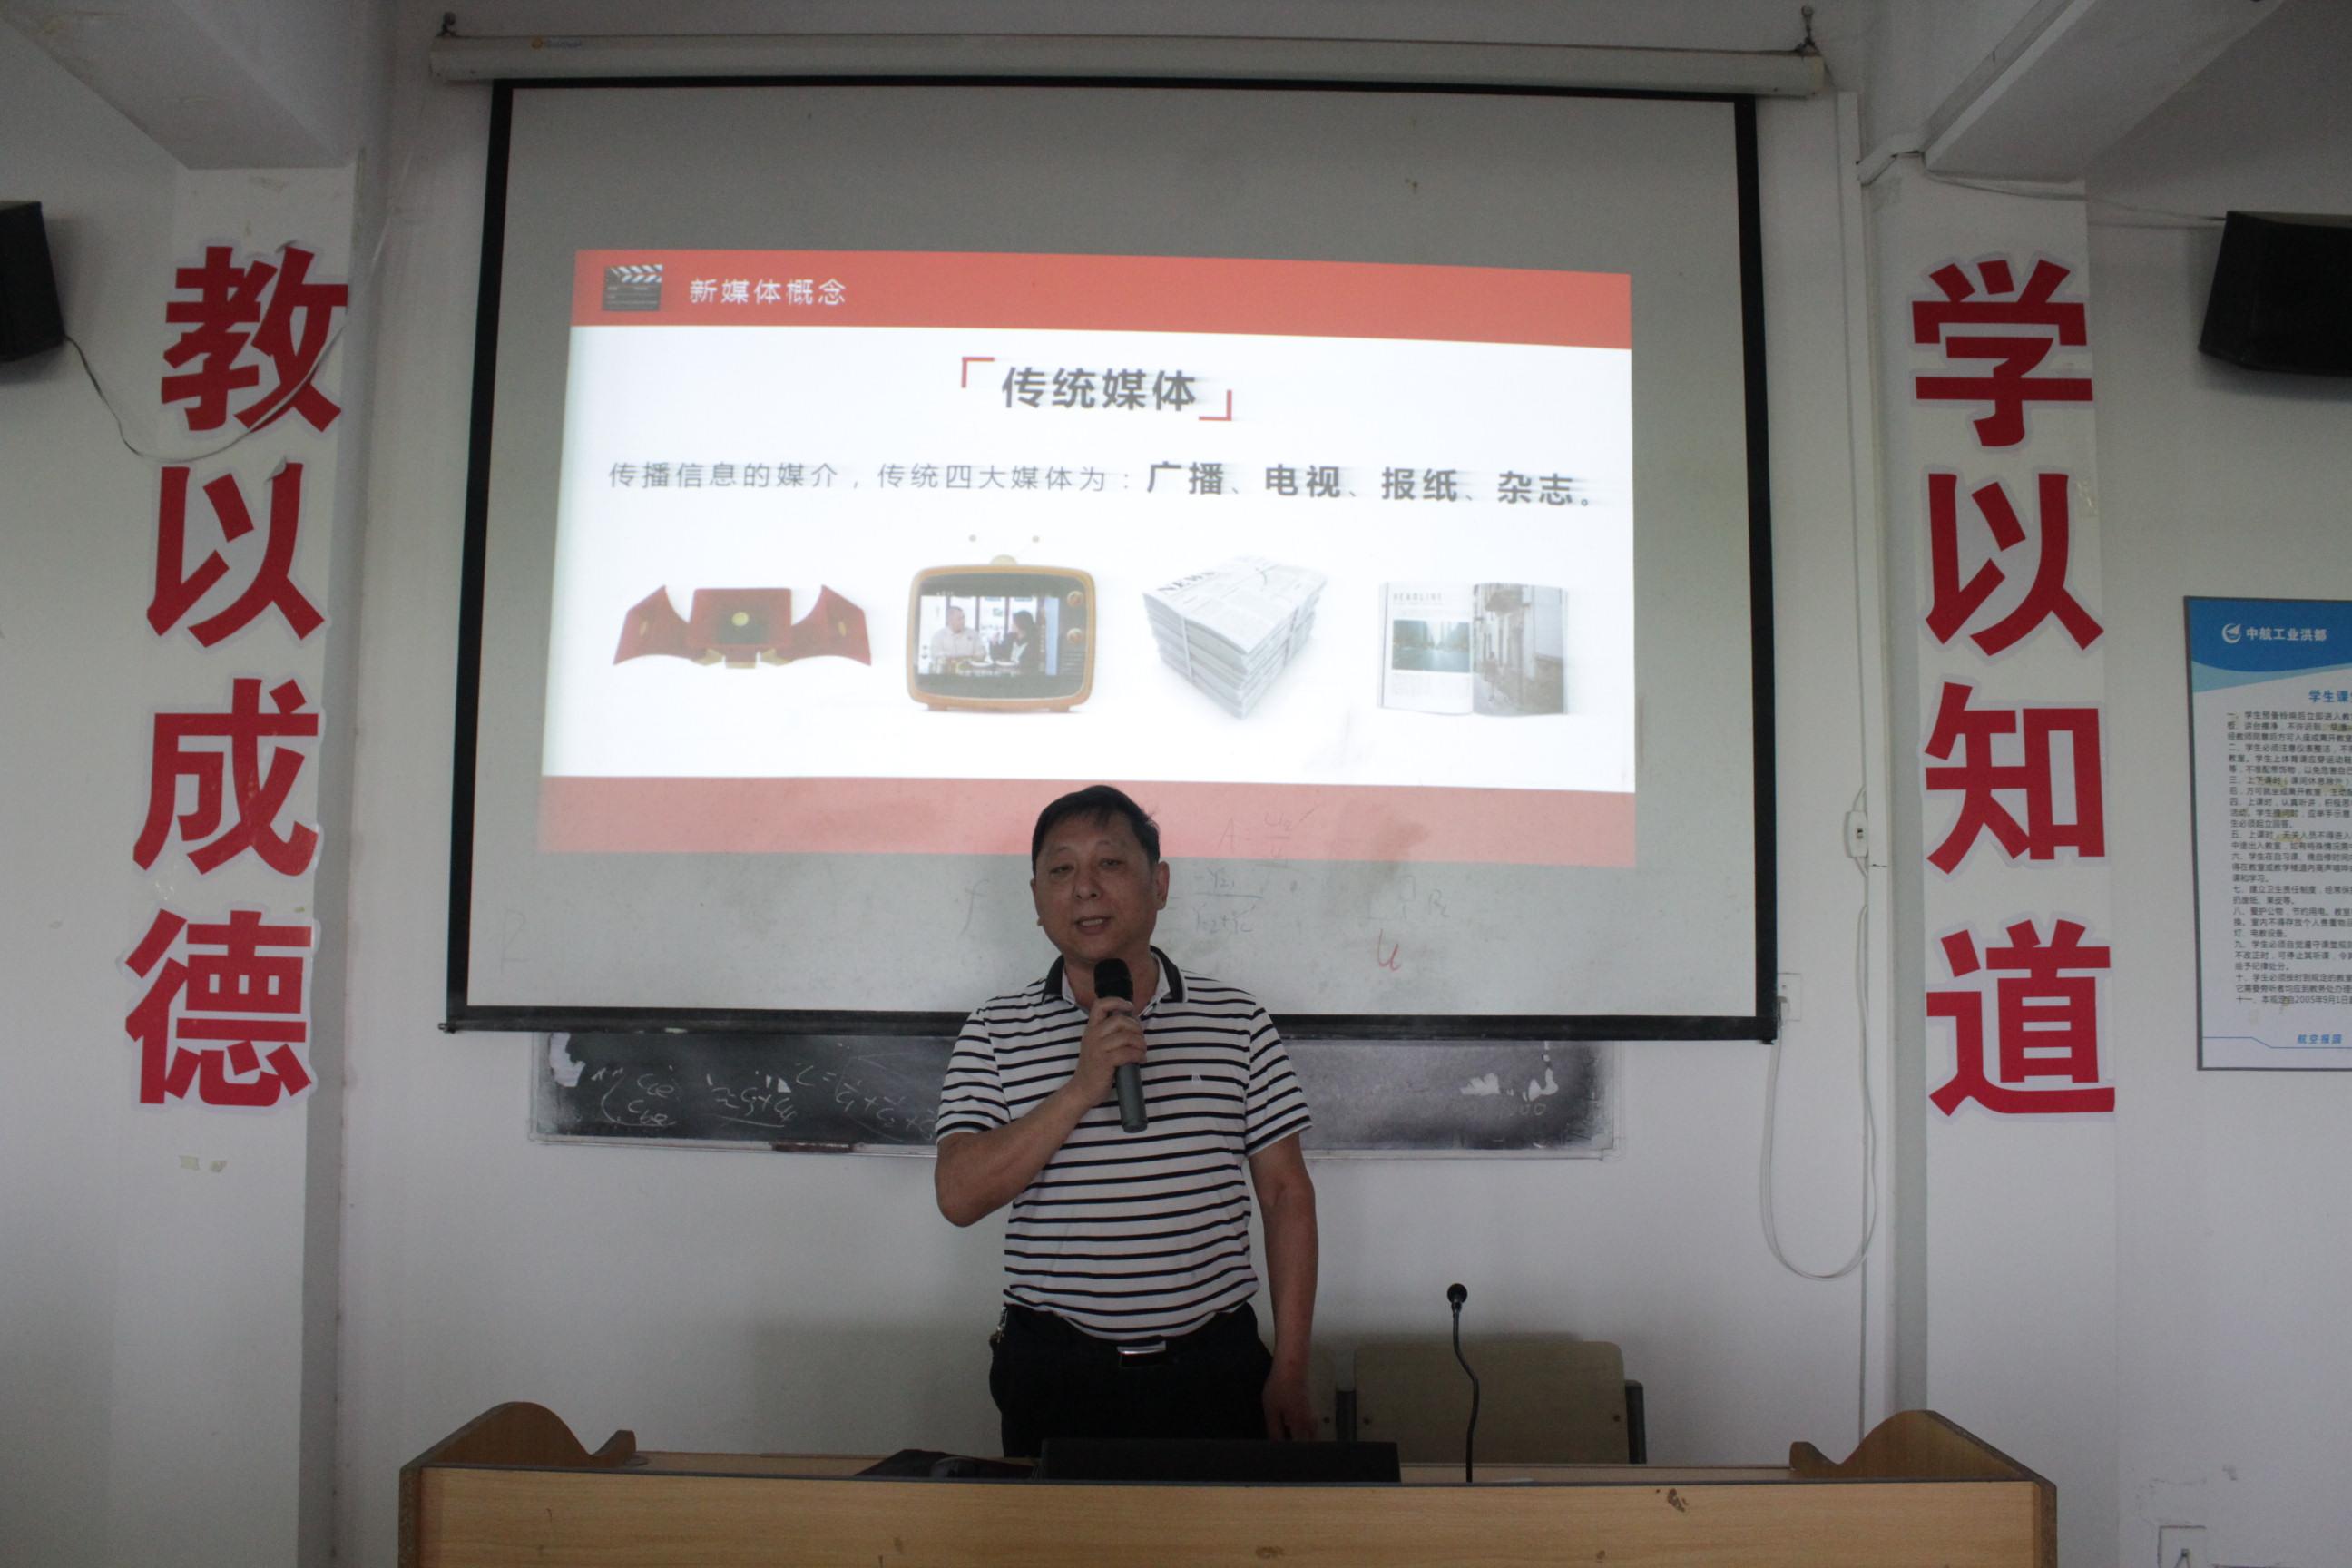 IMG_6431新媒体引导新青年.JPG